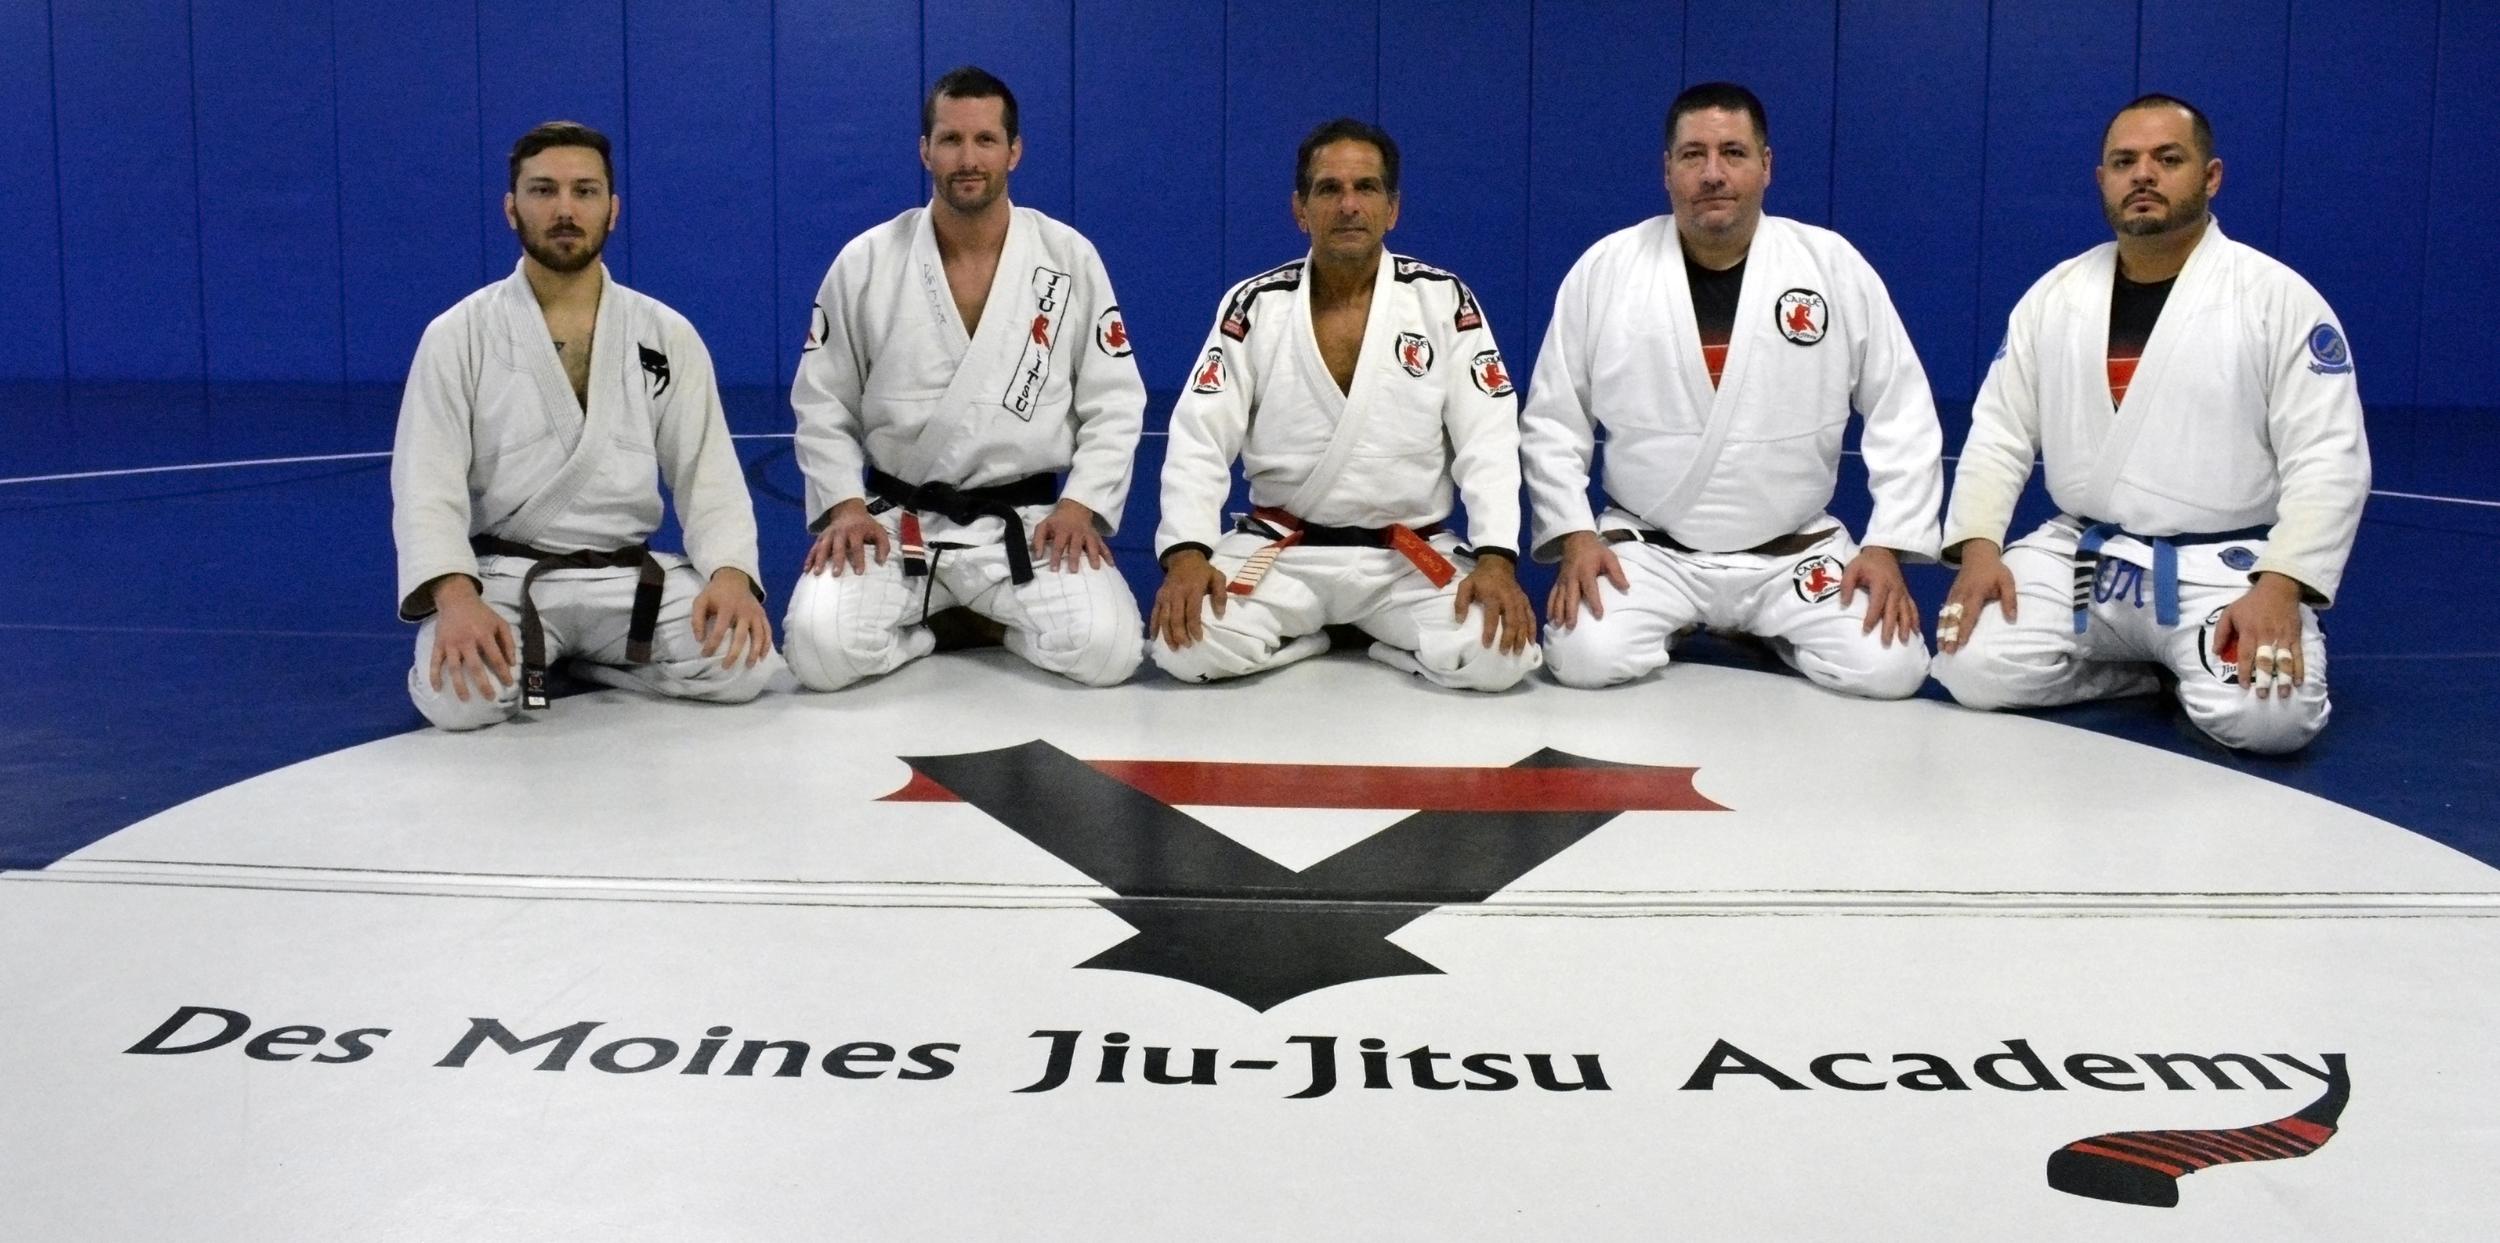 Des Moines Jiu-Jitsu Academy